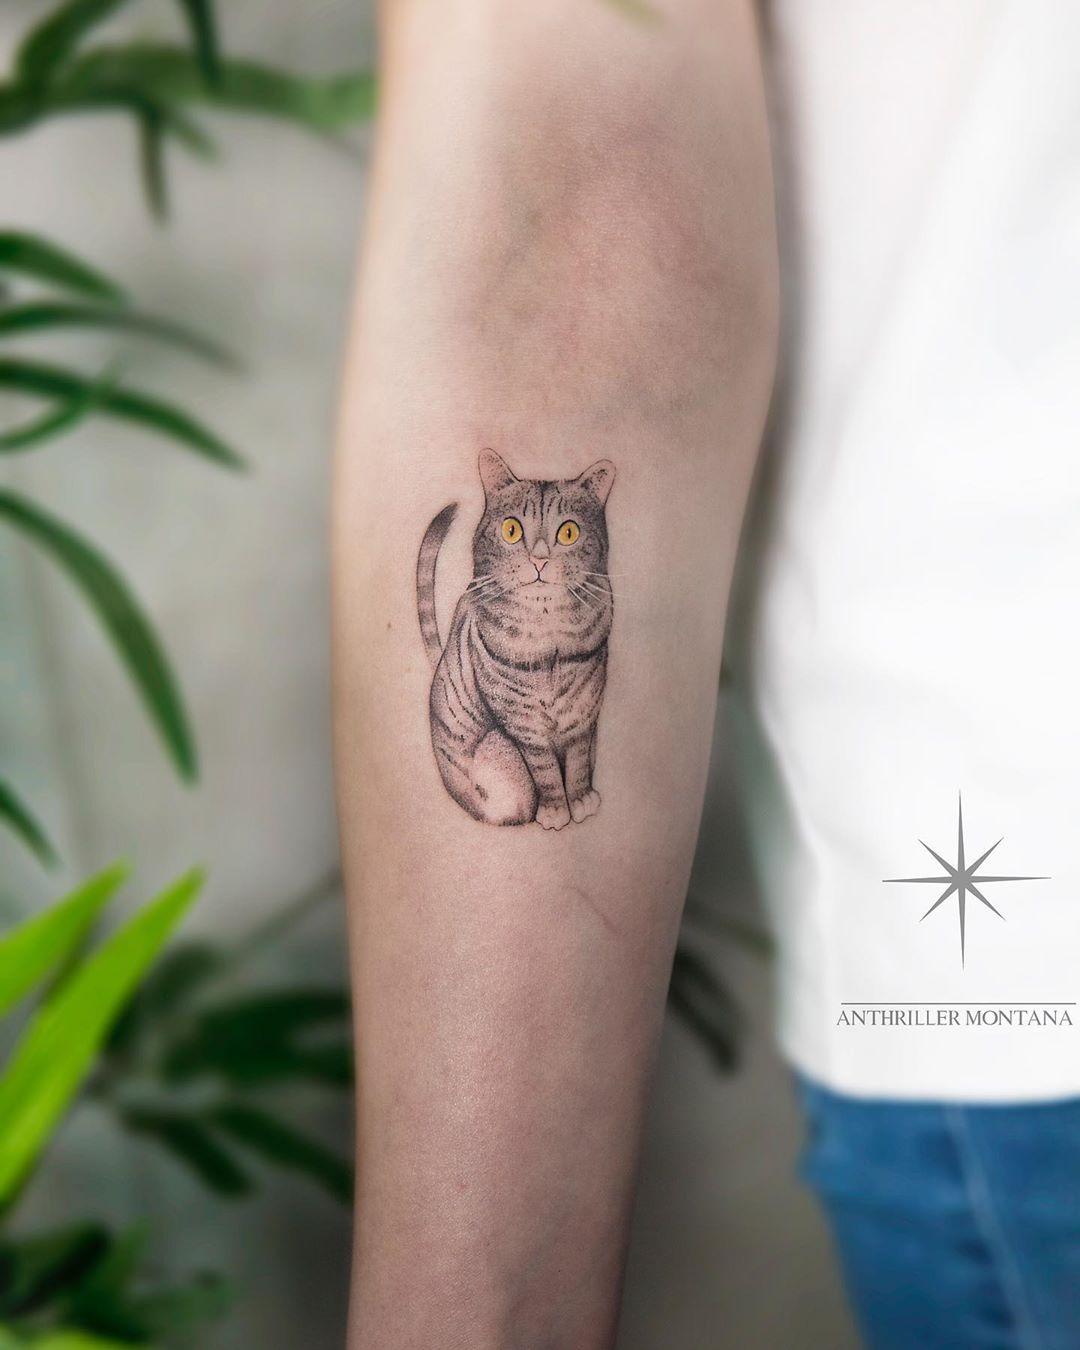 Fineline cat tattoo by Anthriller Montana